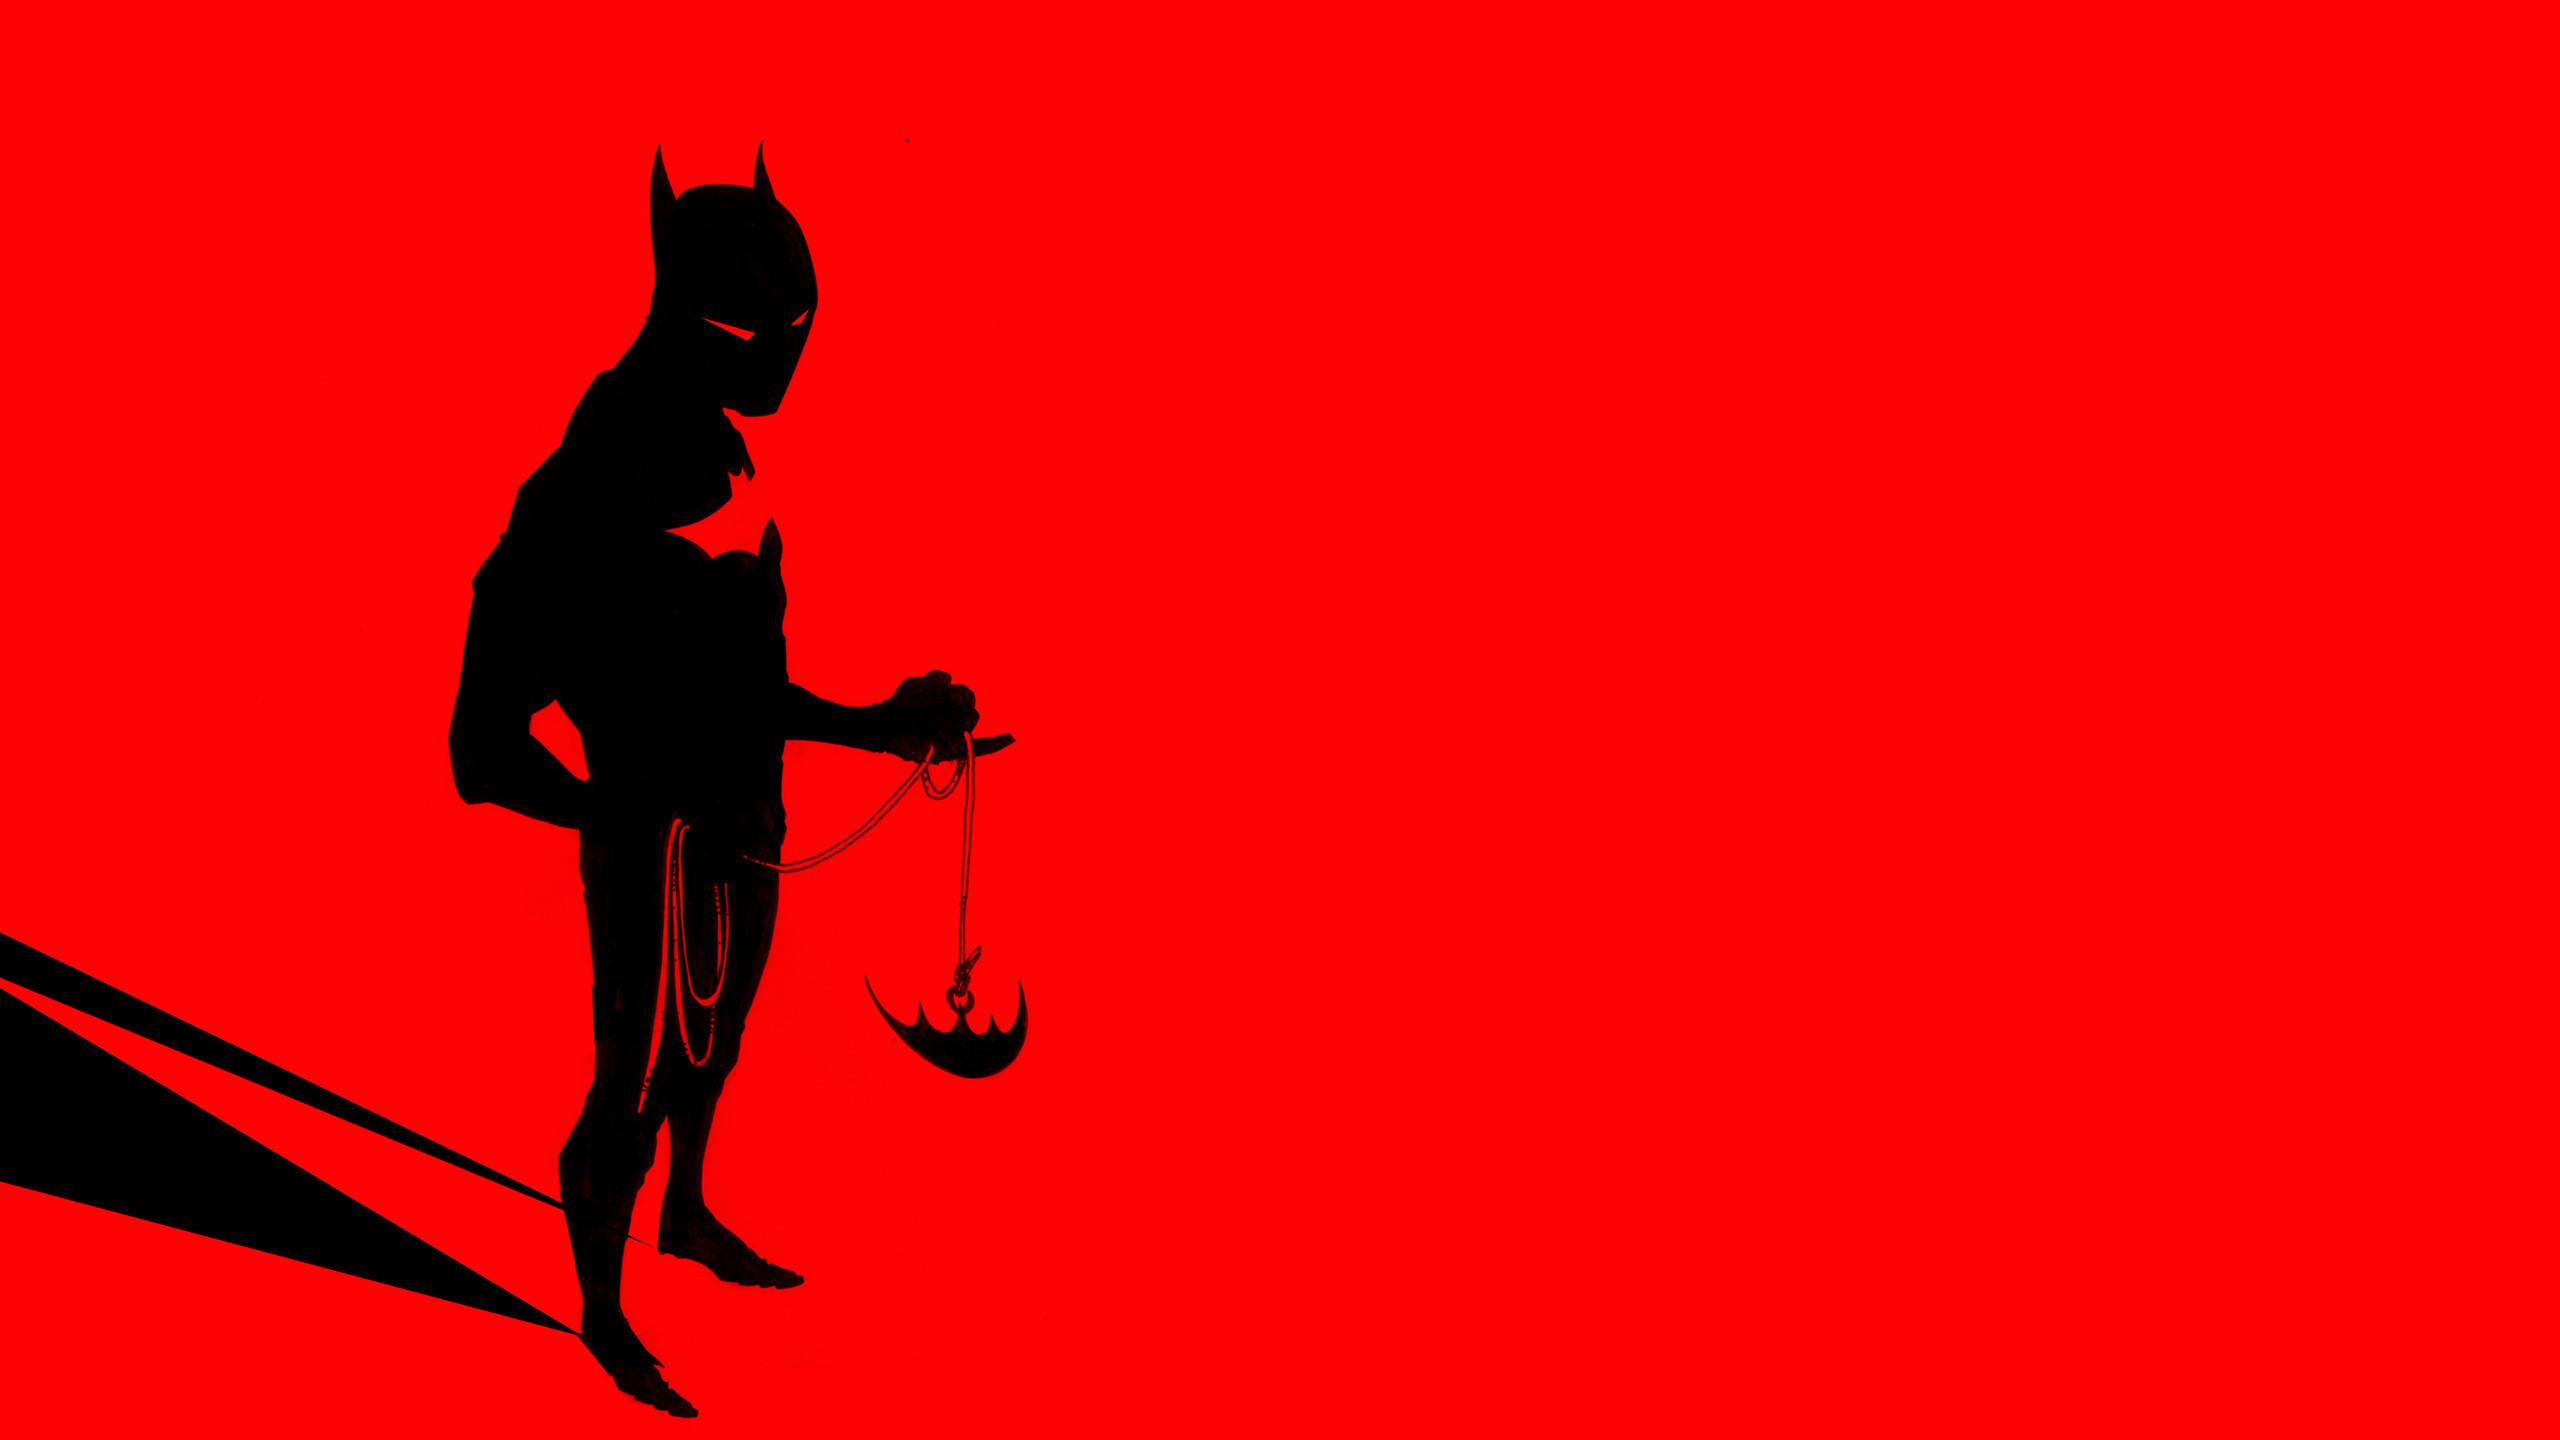 Download. « Batman Beyond Computer Wallpapers · Batman Beyond High  Definition Wallpapers »